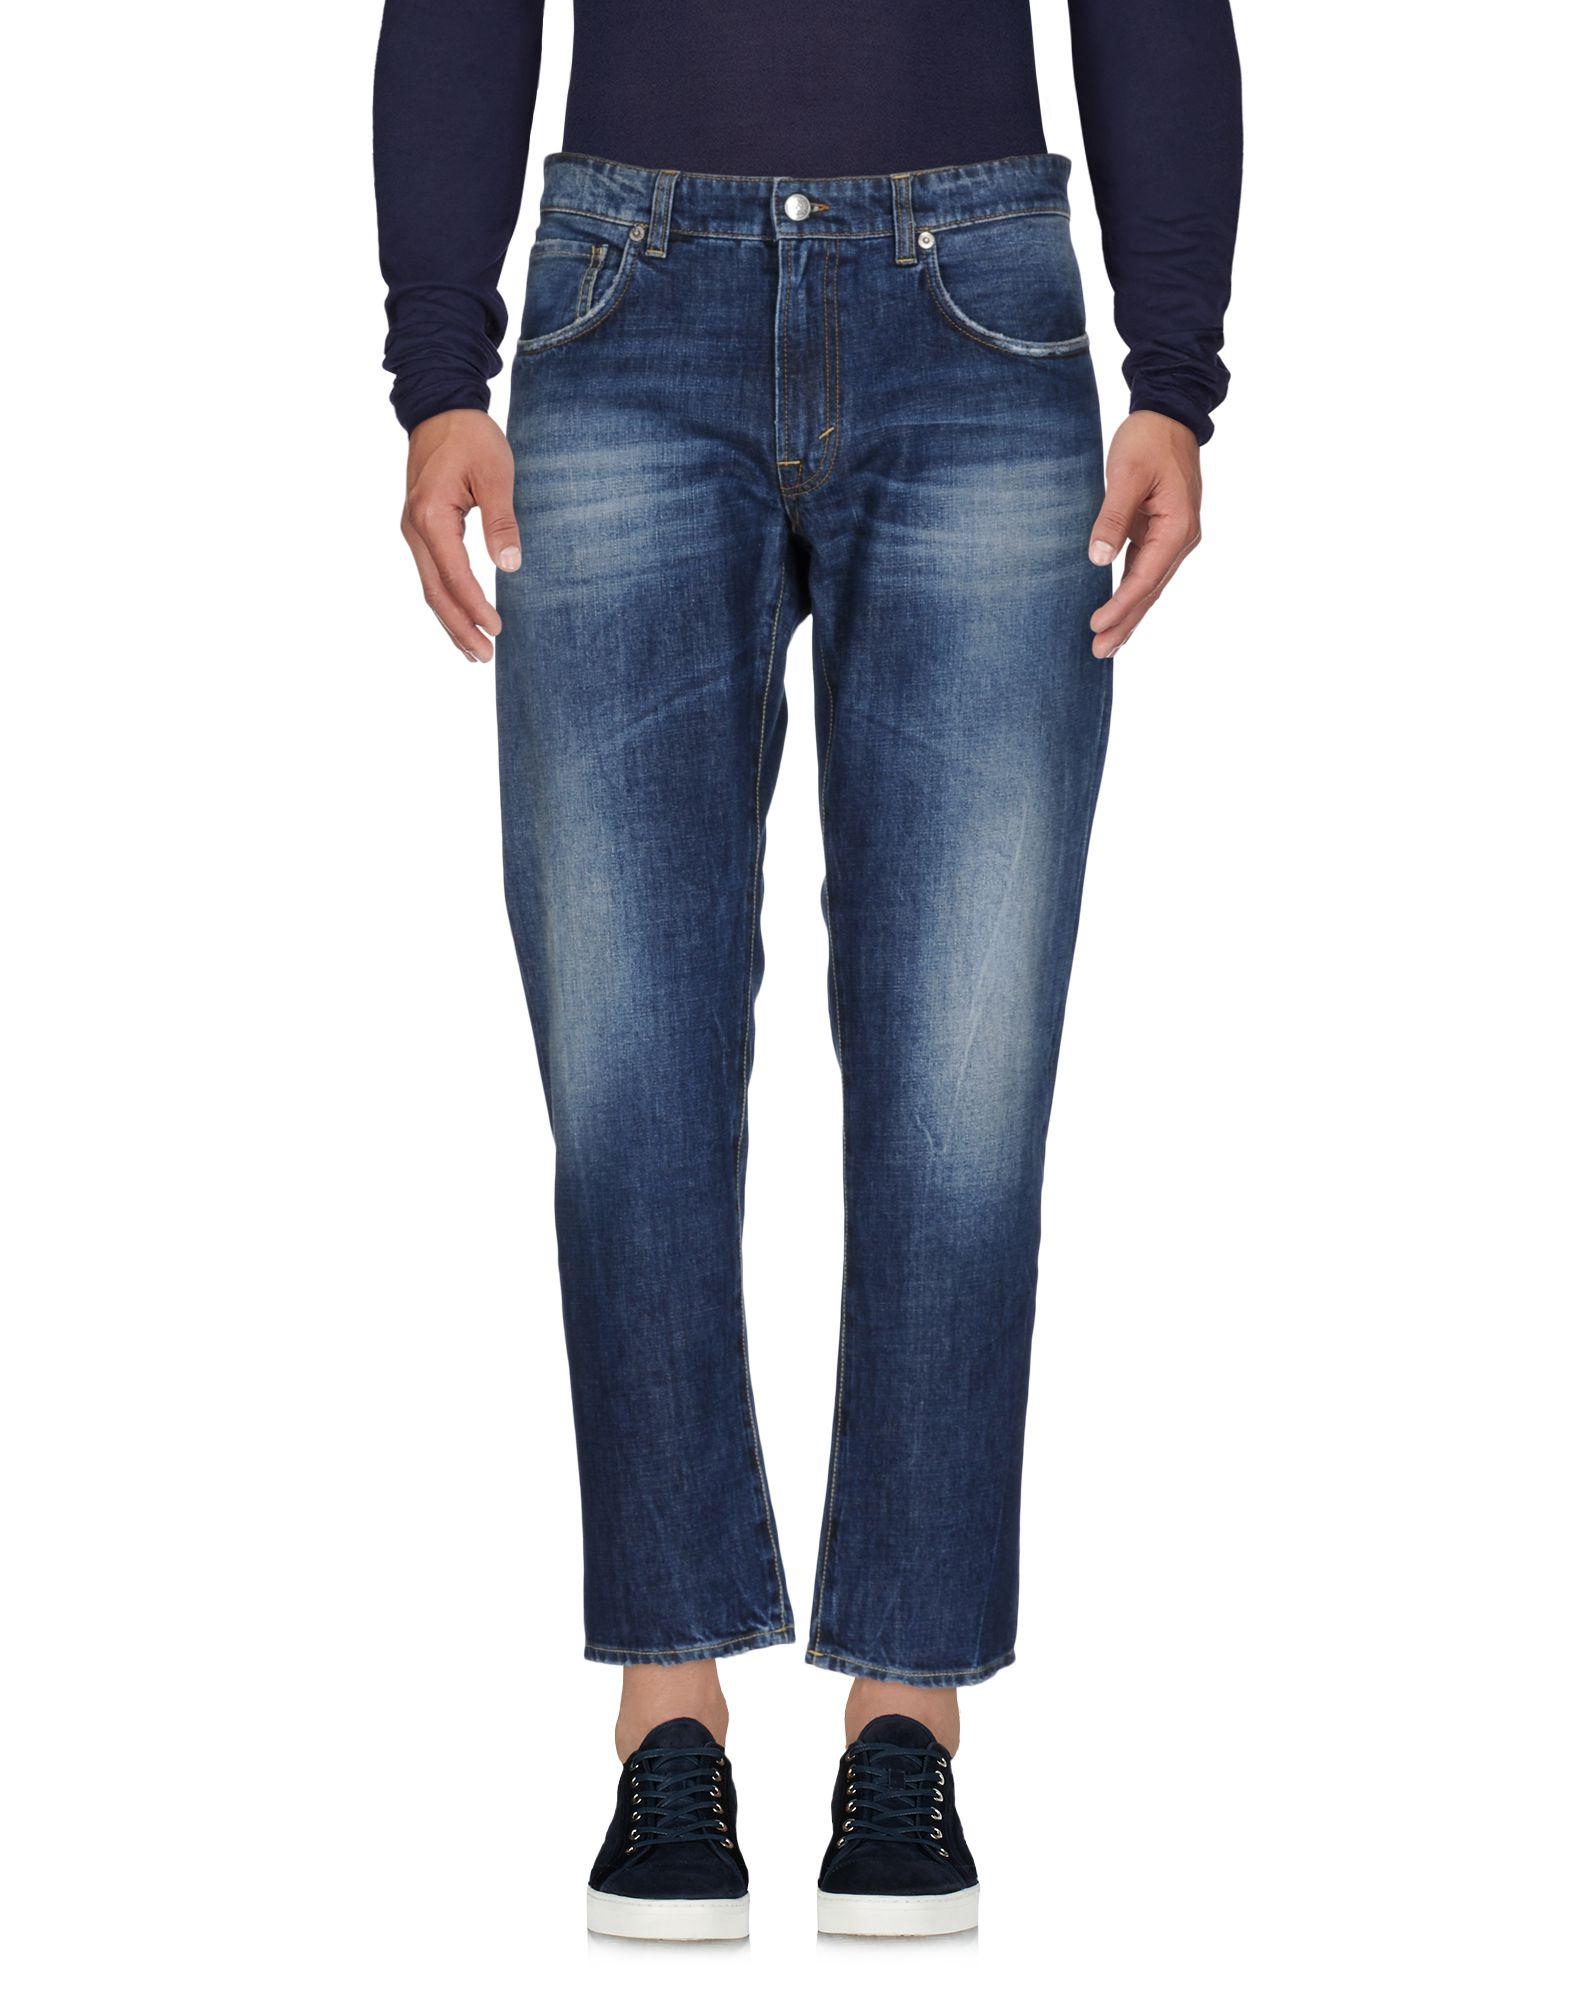 Pantaloni Jeans Department 5 Uomo - Acquista online su